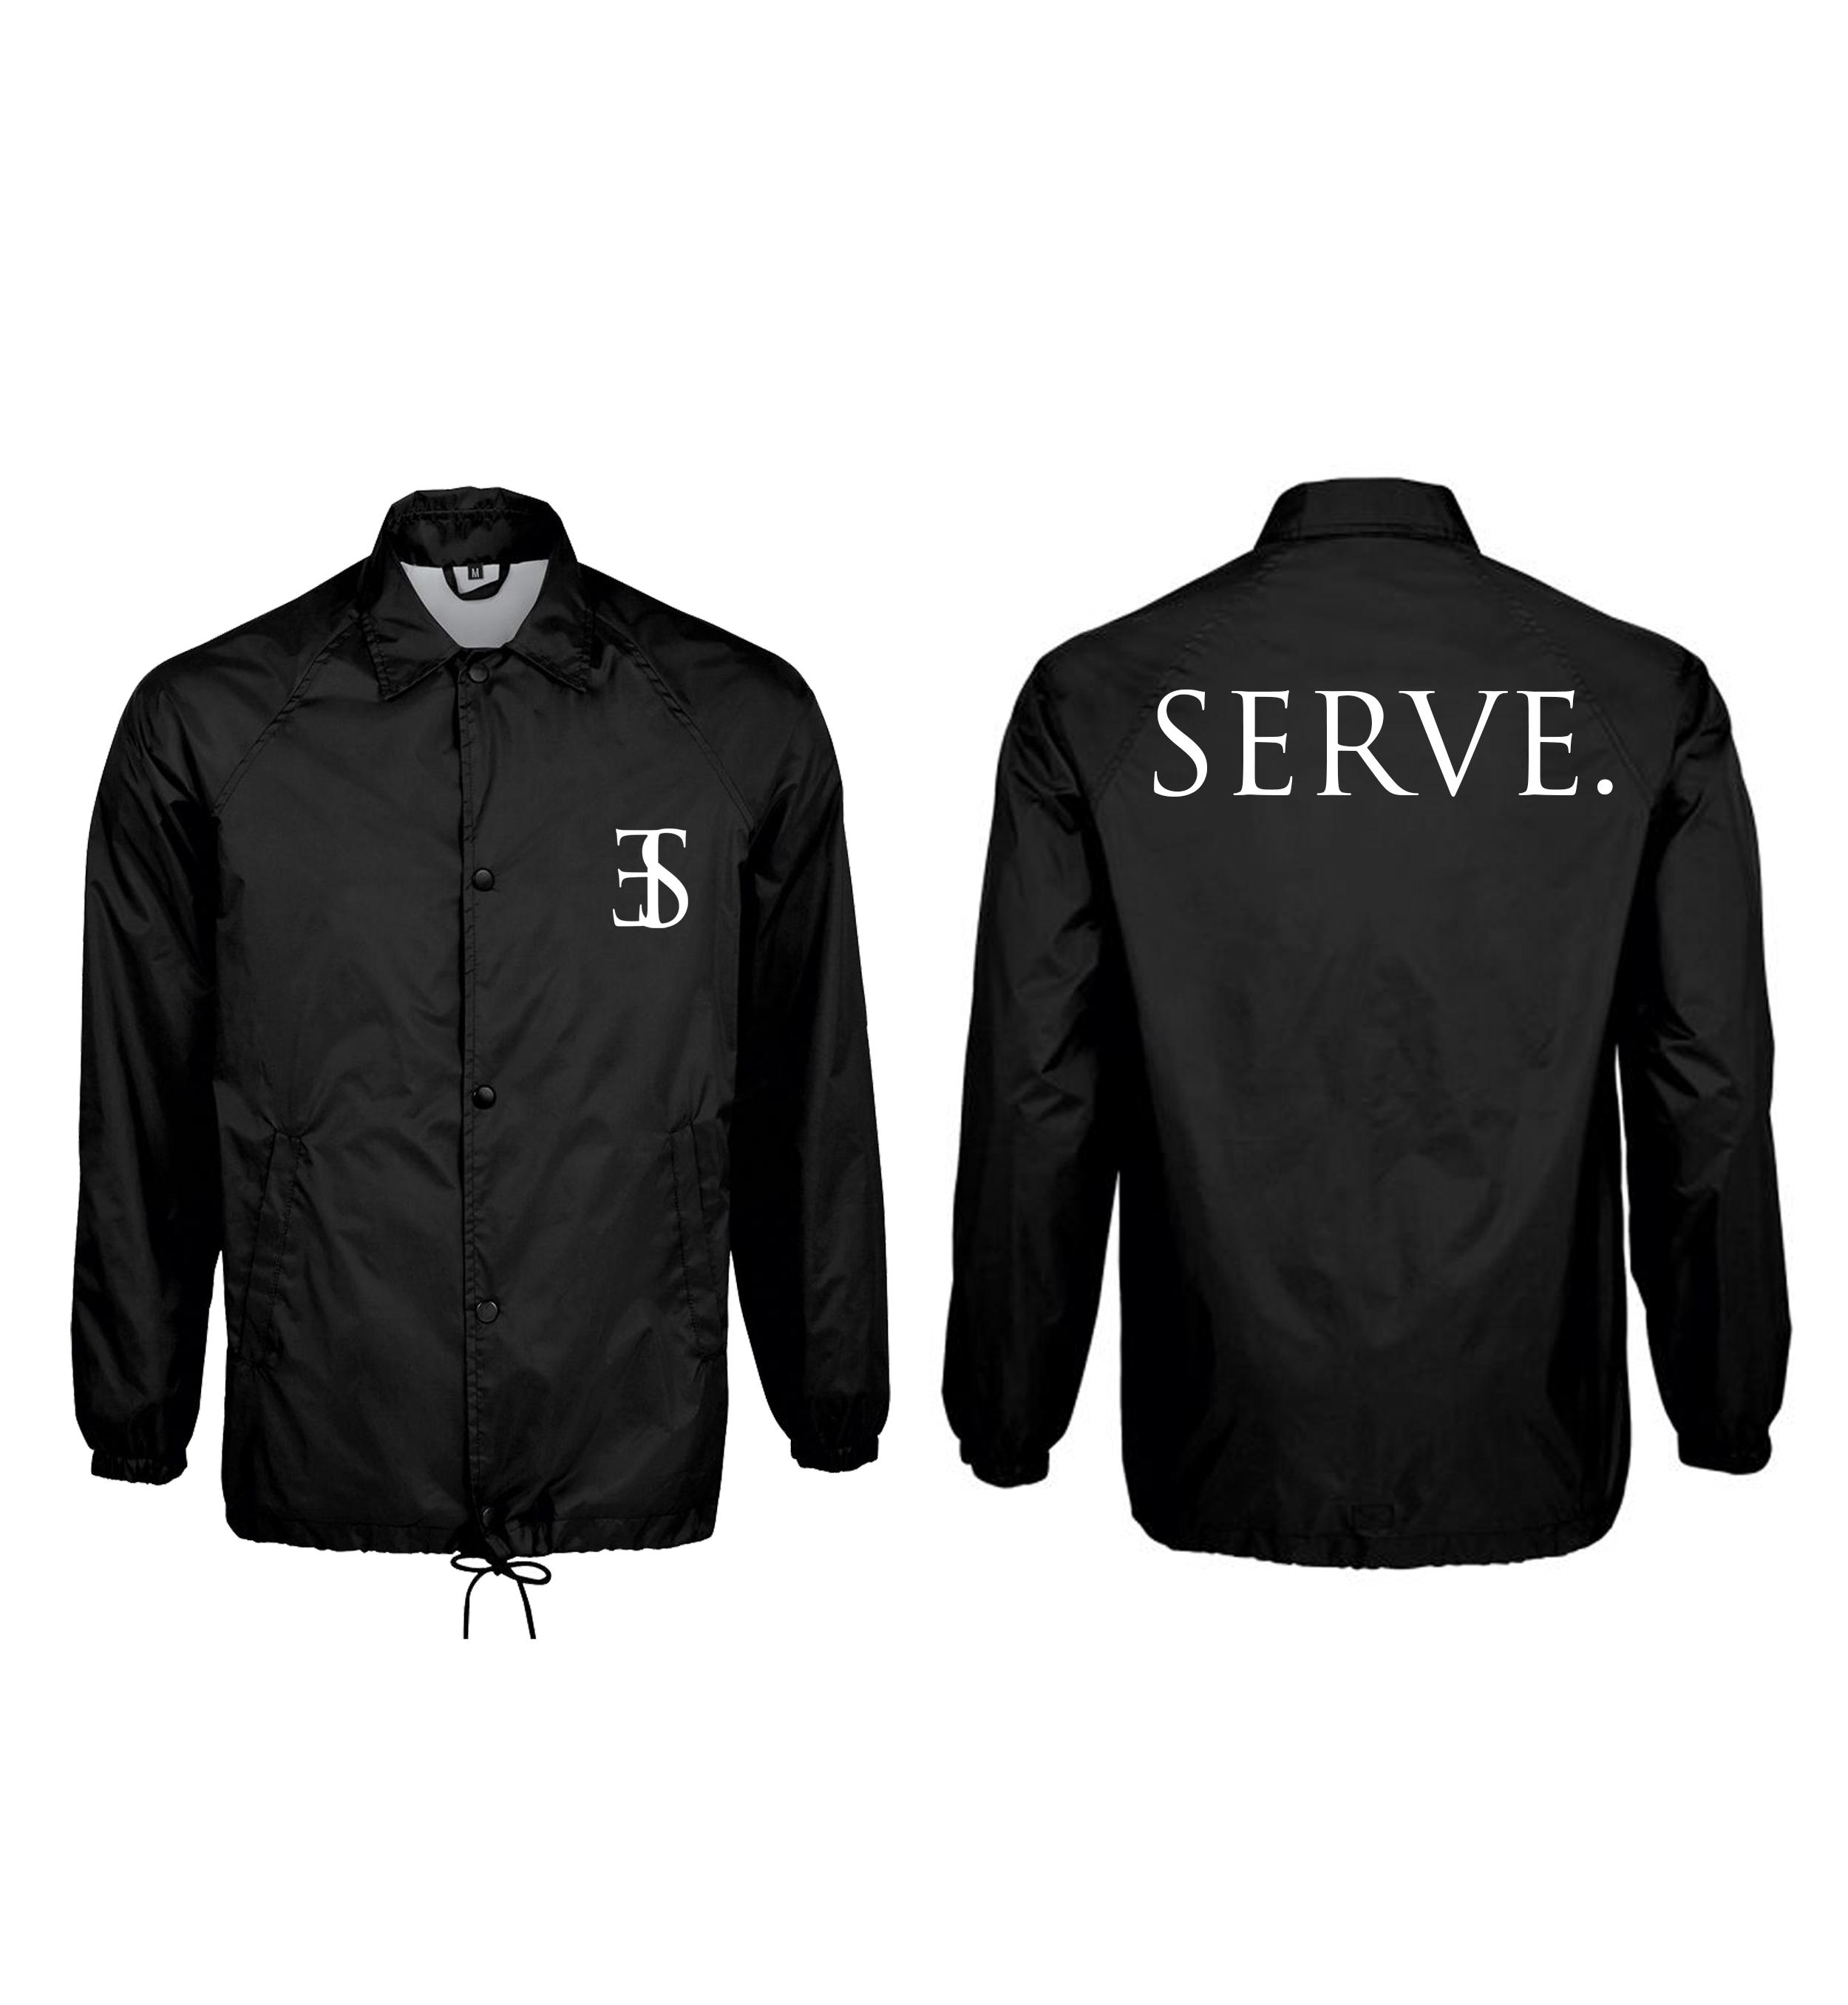 Stage coach jacket PRE-ORDER